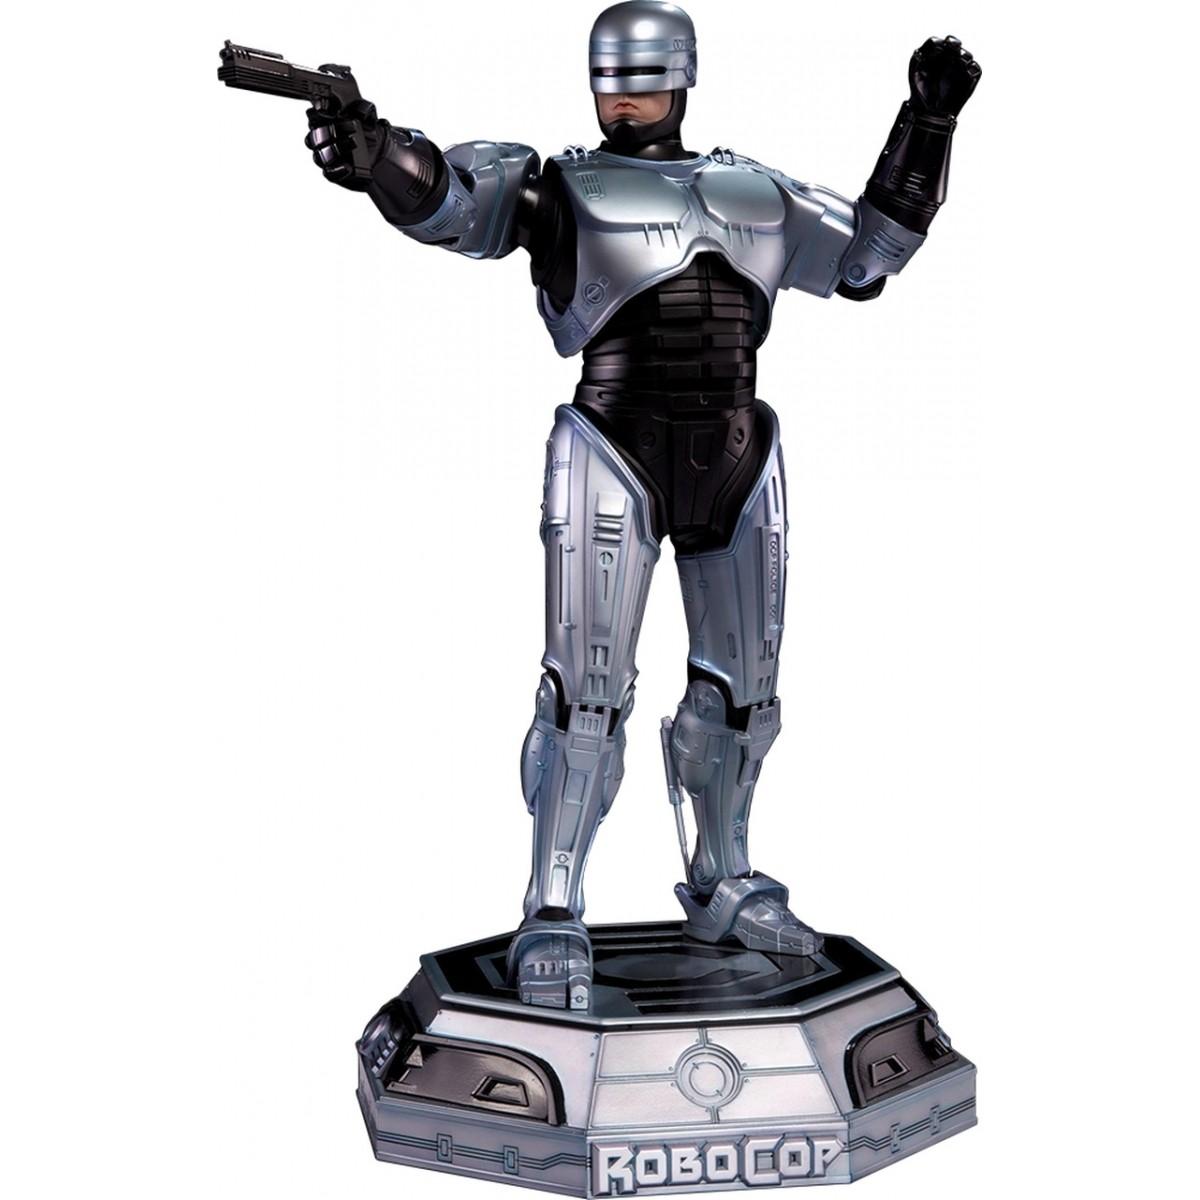 Estátua Robocop Escala 1/4 - Pop Culture Shock